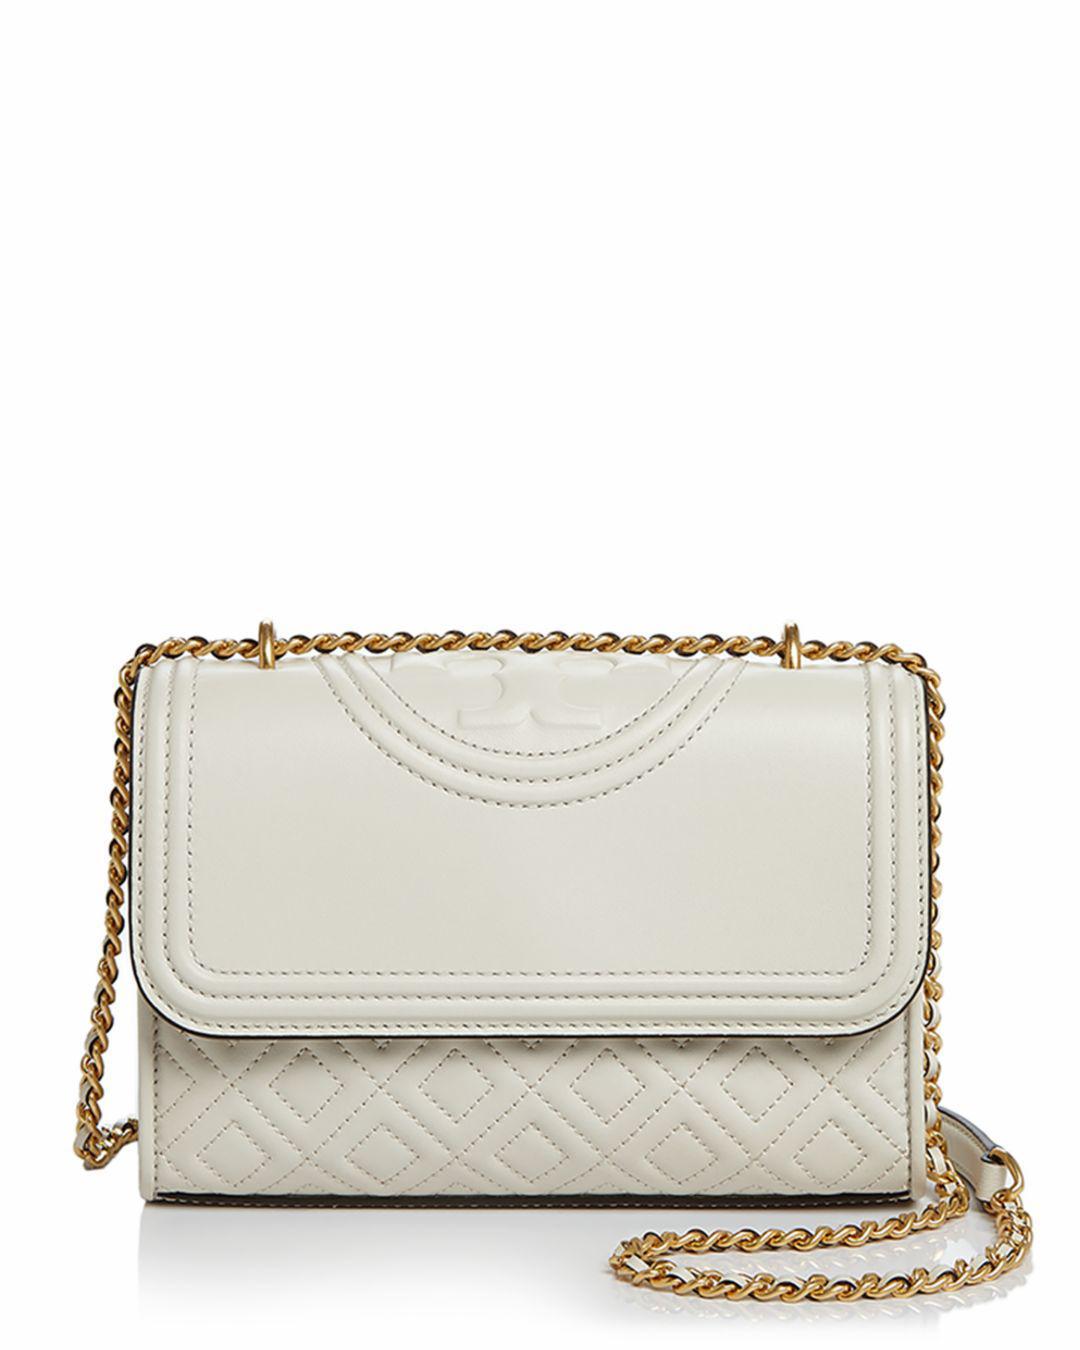 31e511f60203 Tory Burch. Women s Black Fleming Convertible Small Leather Shoulder Bag